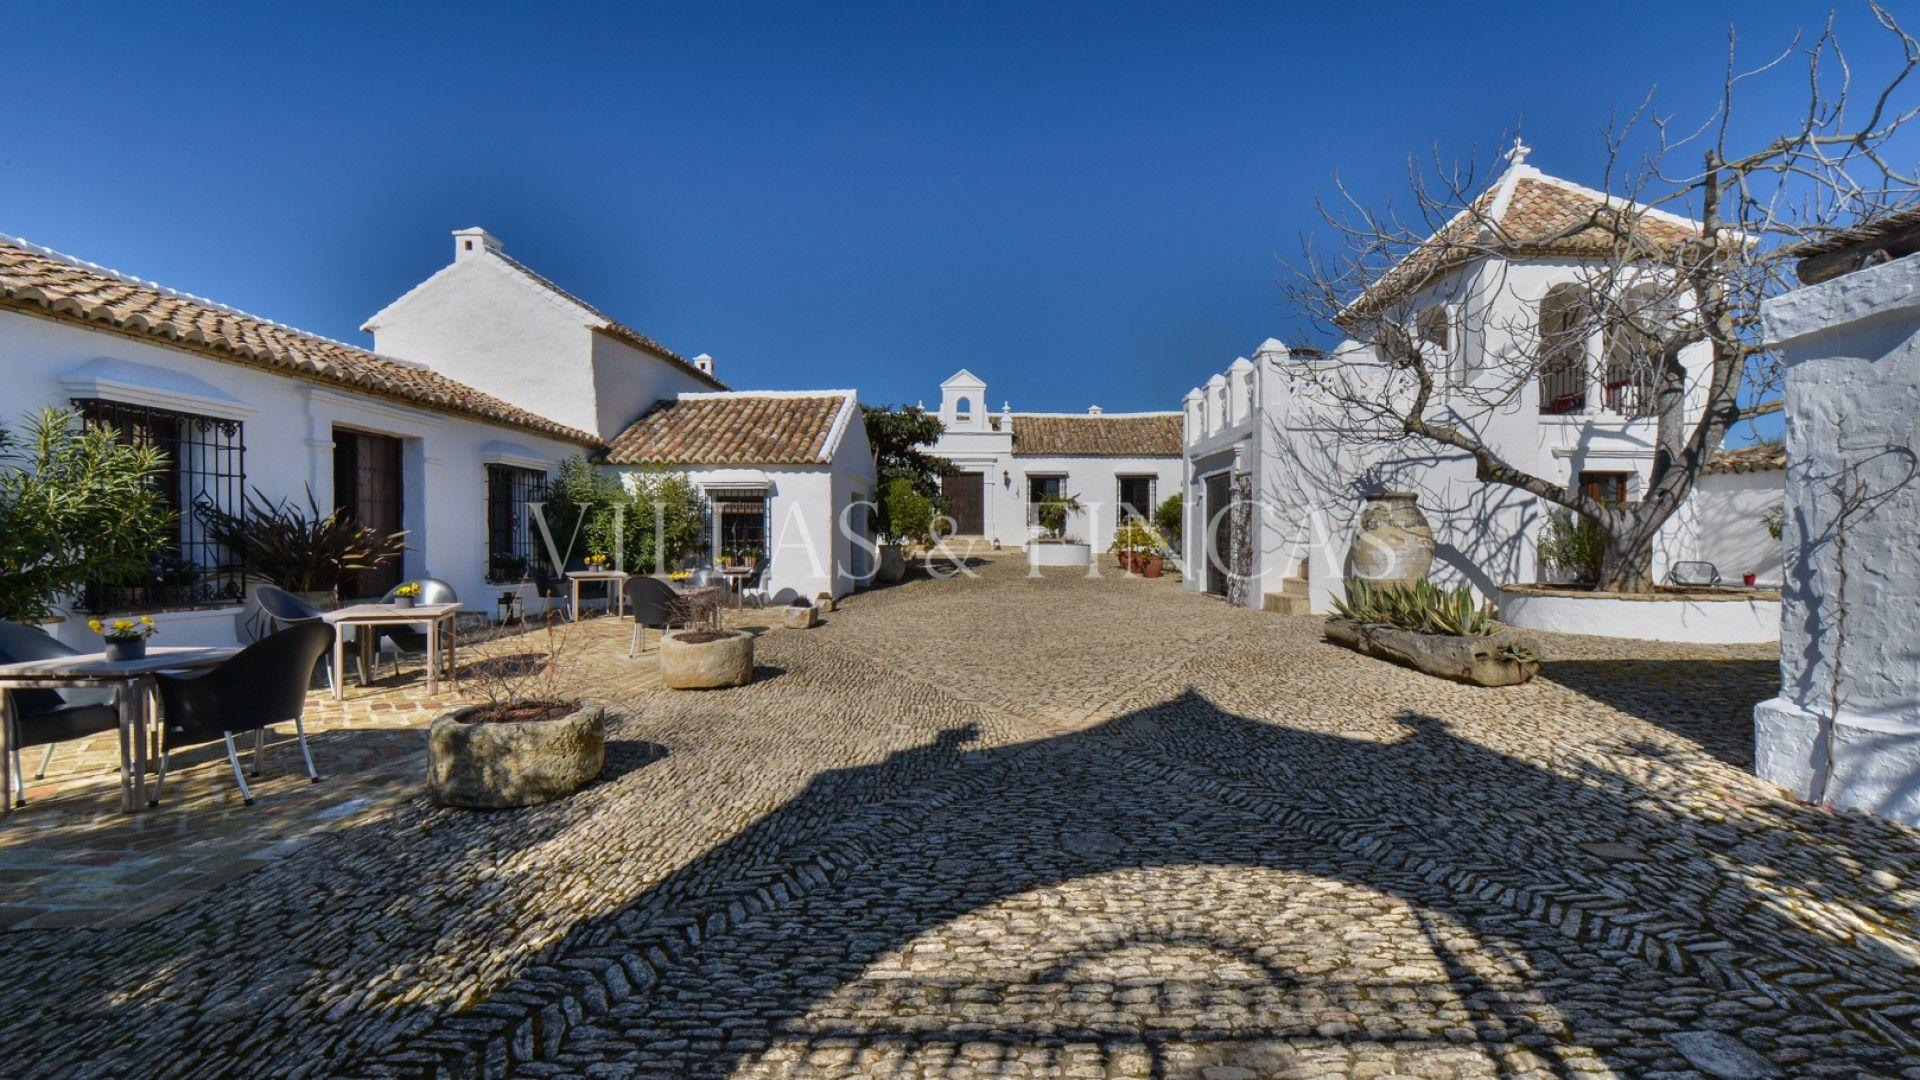 Cortijo espectacular en Andalucía, Ronda | Cortijos en venta, Casas ...